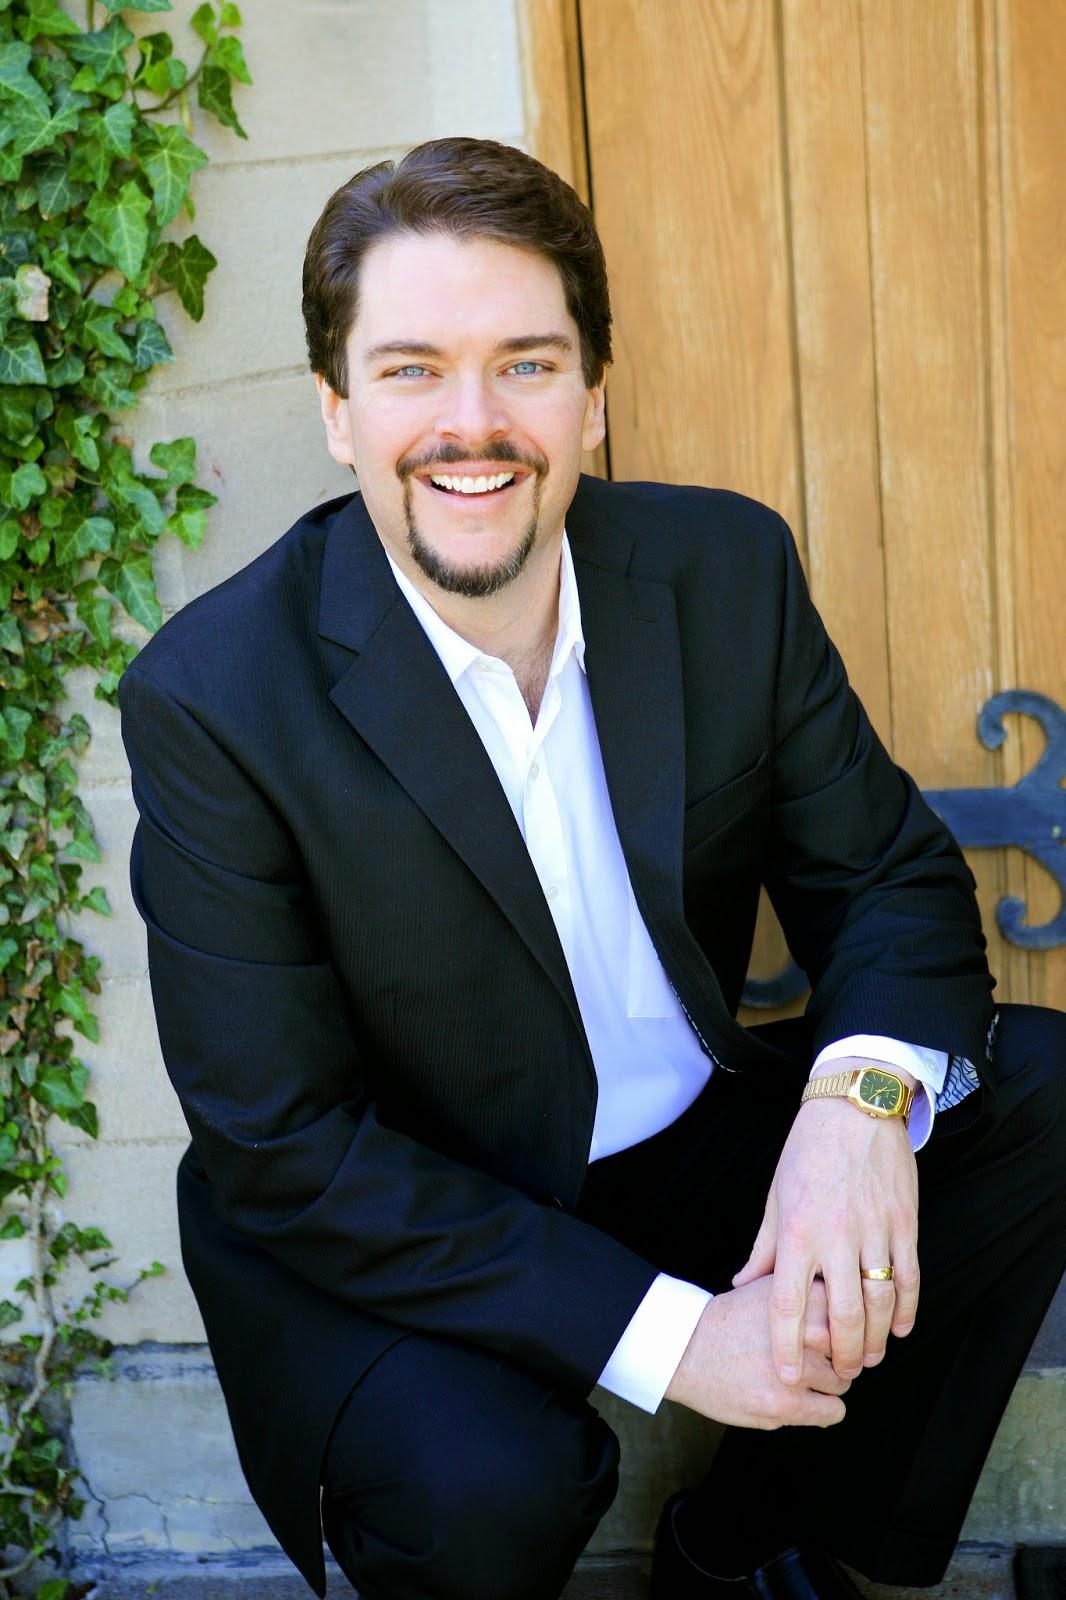 Musical artist Phil Morgan